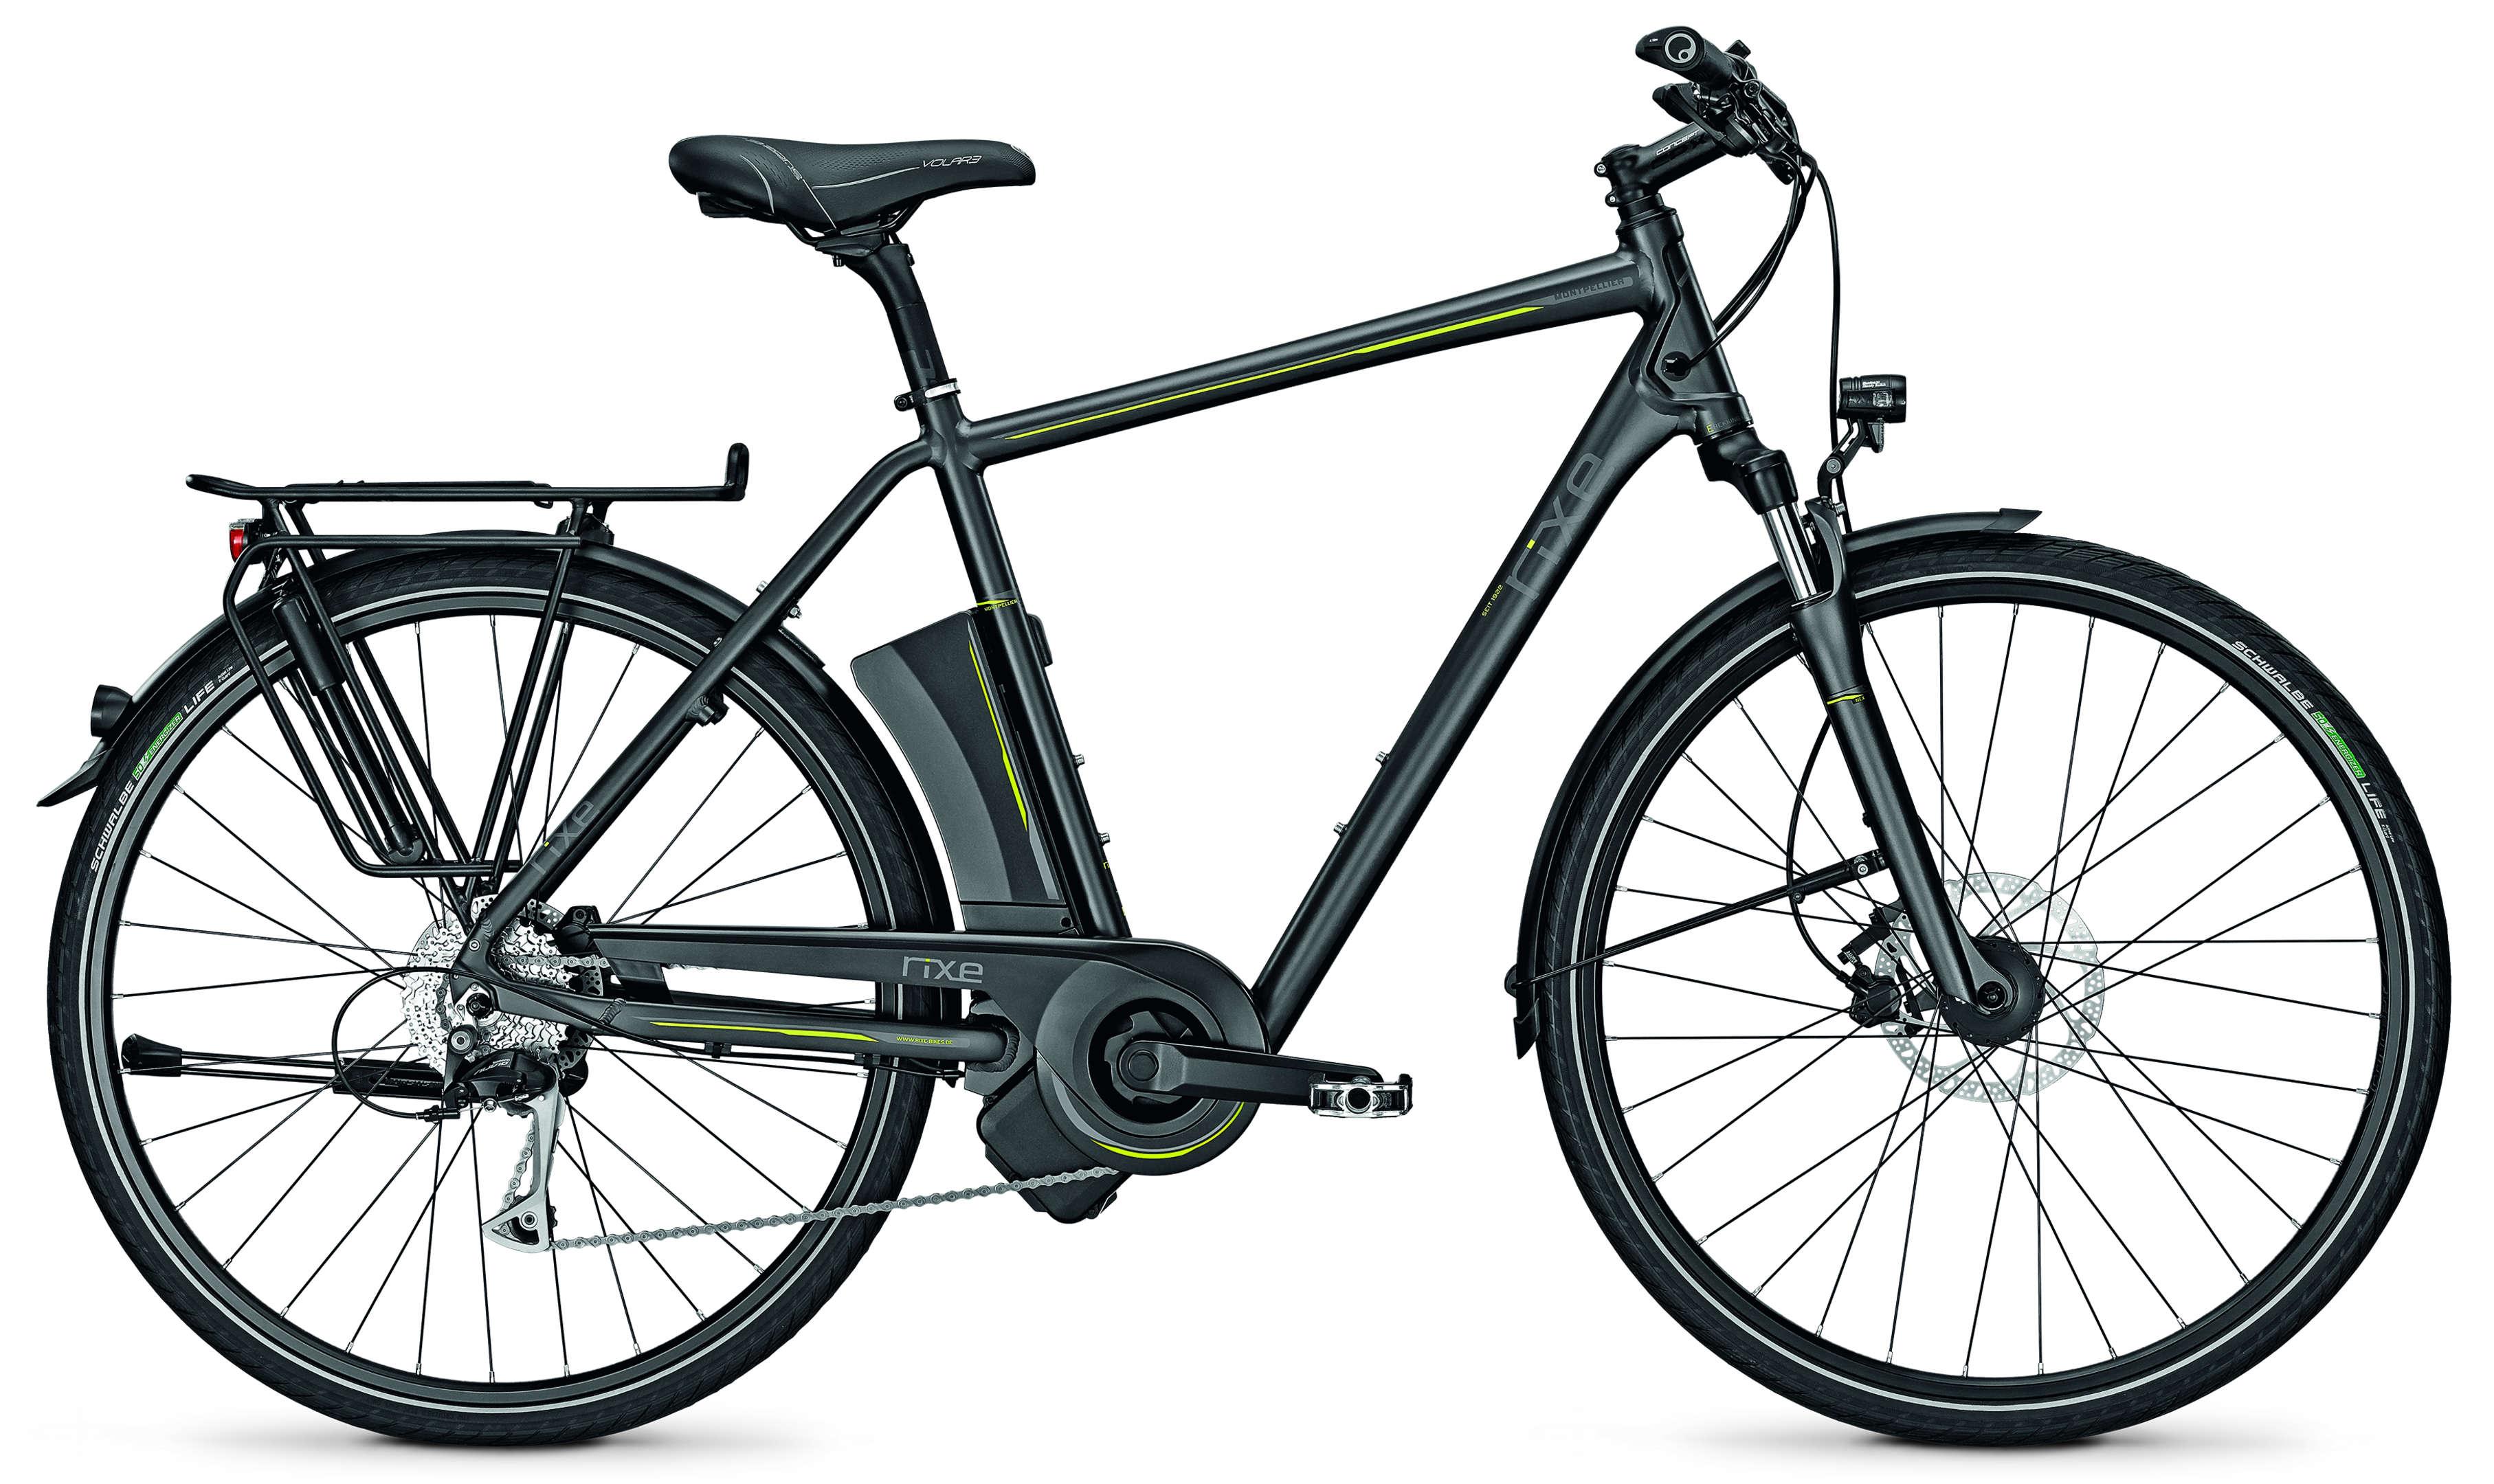 rixe e bike montpellier i9 eurorad bikeleasingeurorad bikeleasing. Black Bedroom Furniture Sets. Home Design Ideas